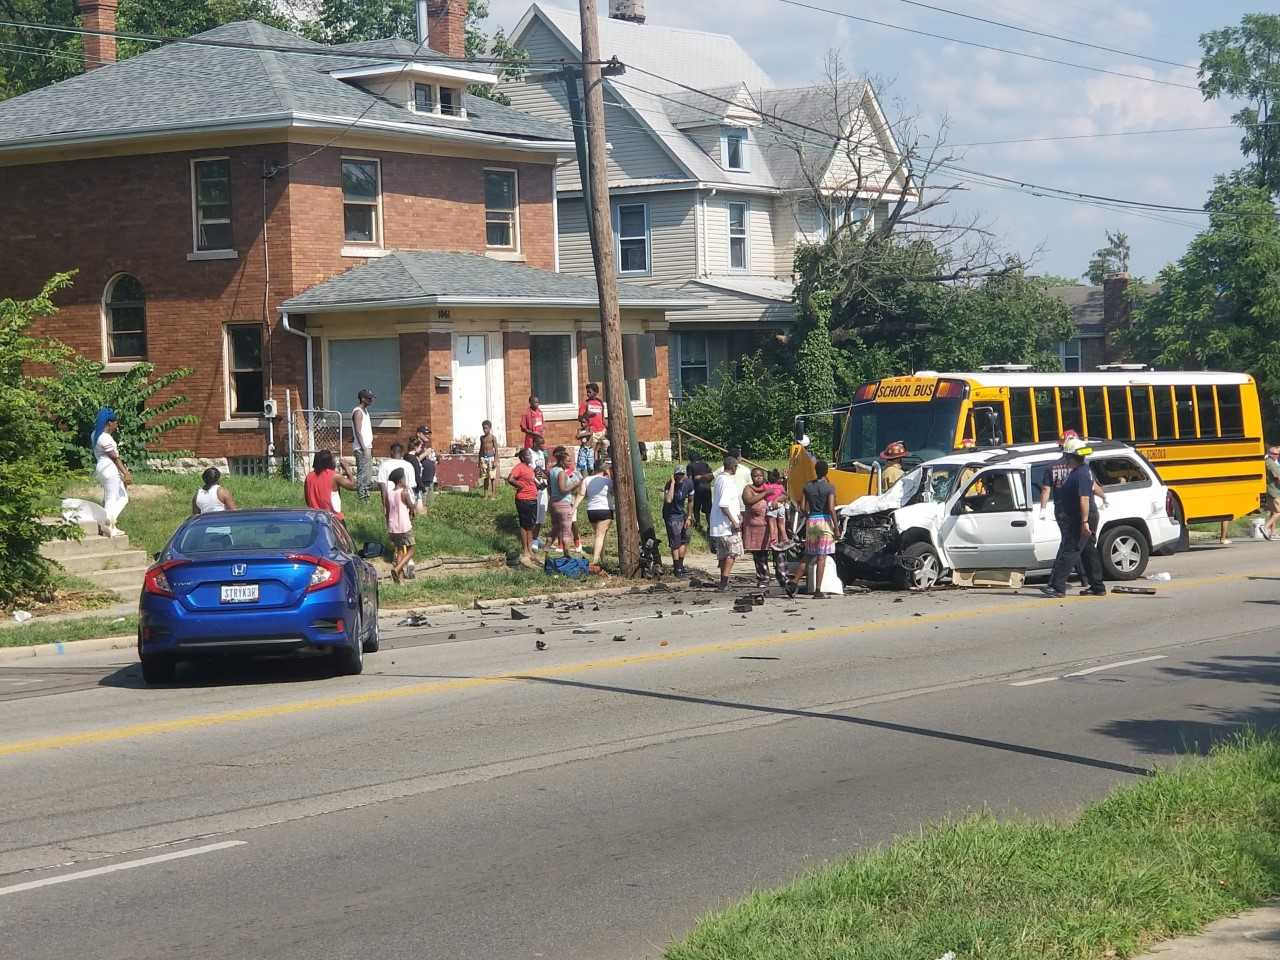 8 injured in crash between school bus, SUV | WDTN